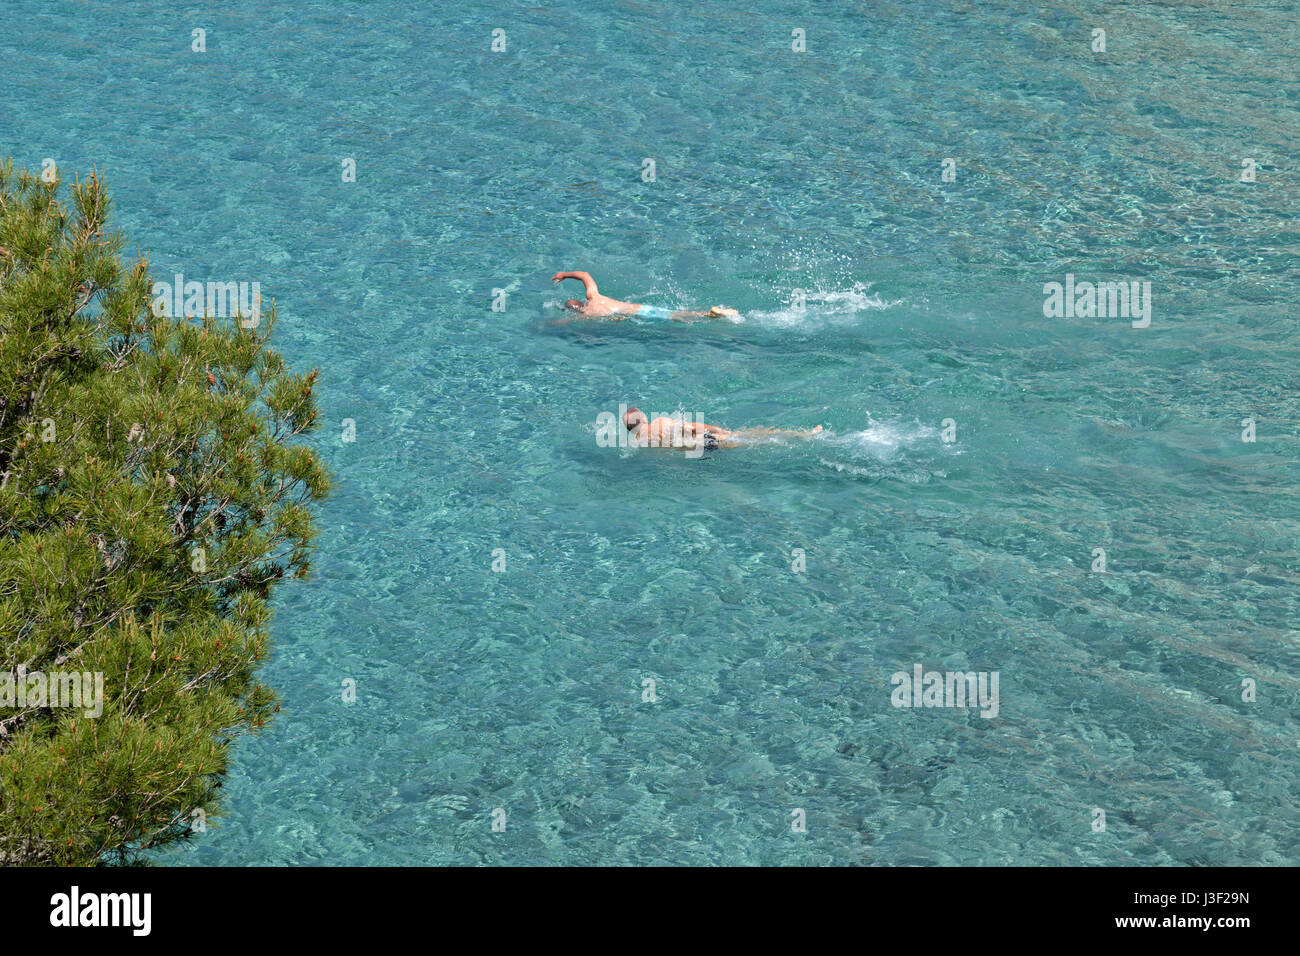 swimmers near Sant Elm, Mallorca, Spain - Stock Image